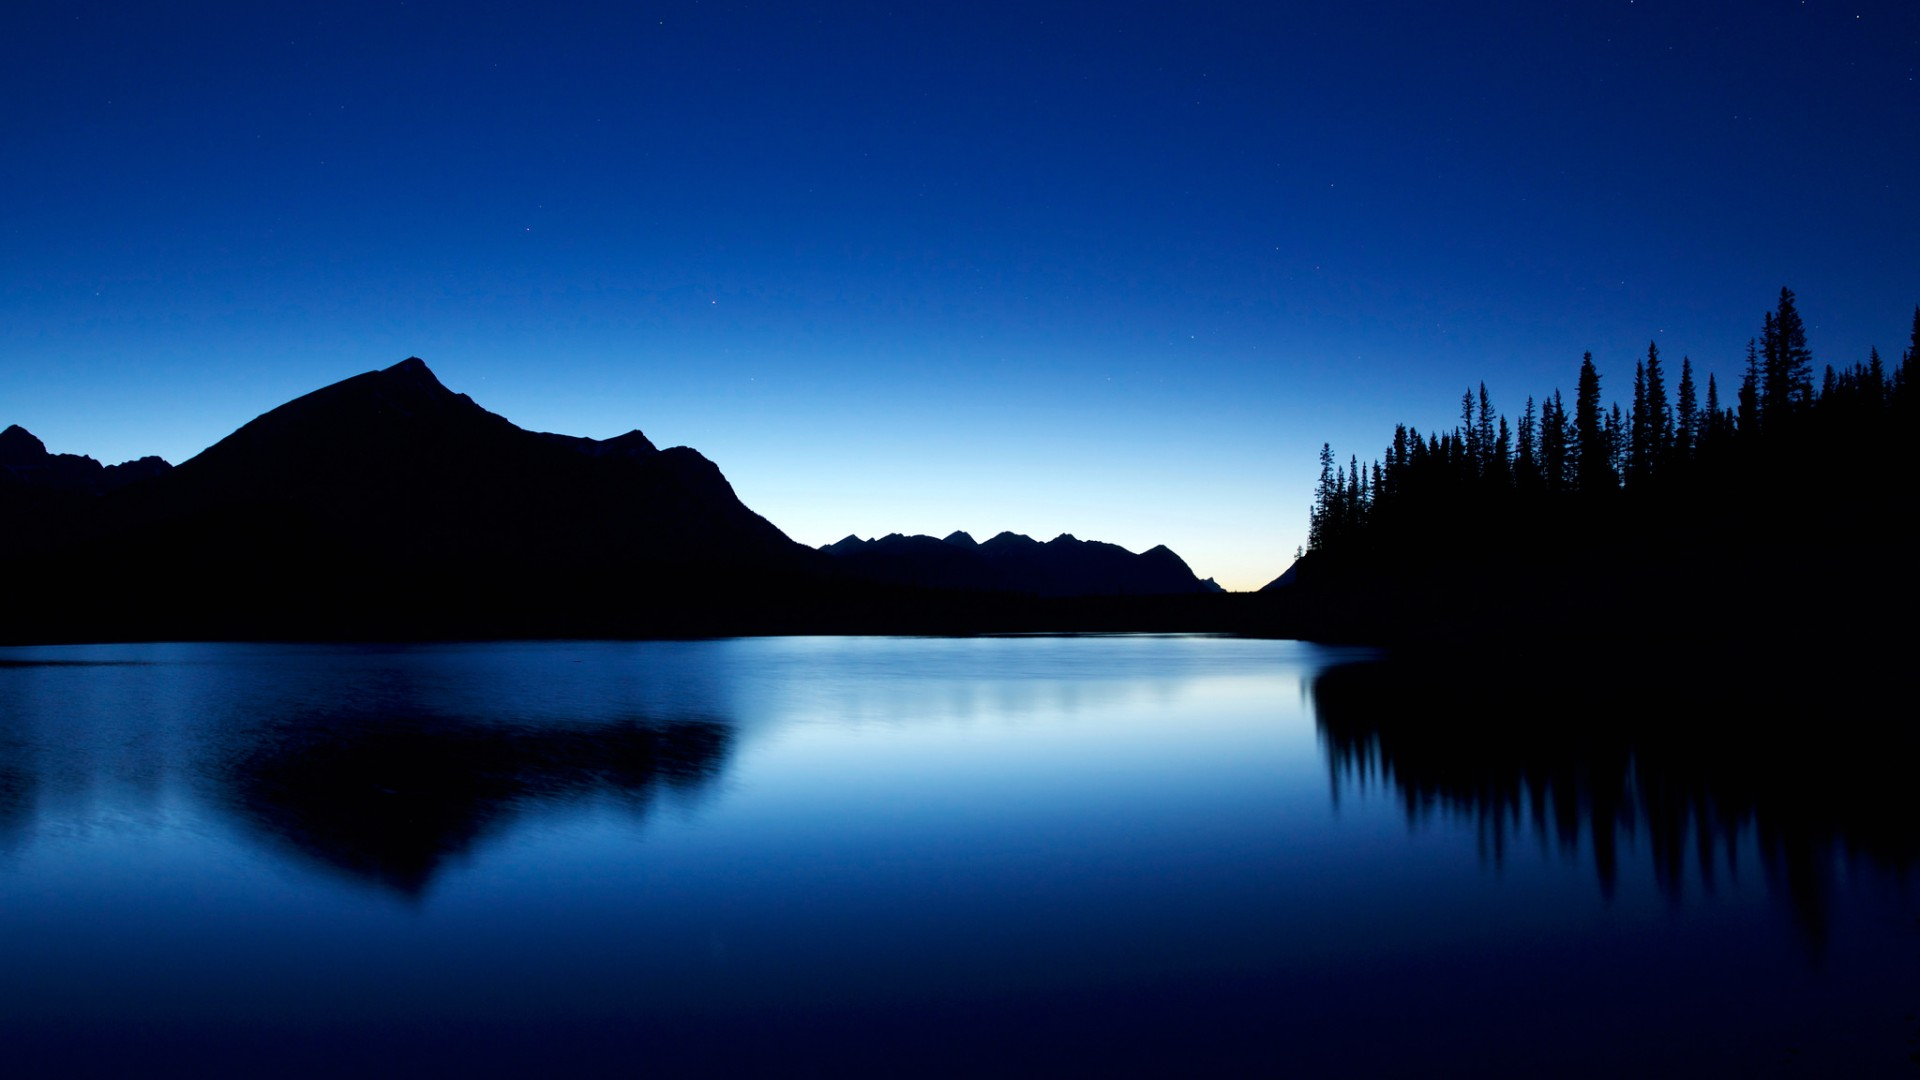 Windows 10 Wallpaper Hd 1920x1080 Cars Alberta Canada Lake Night Landscapes Blue Wallpaper